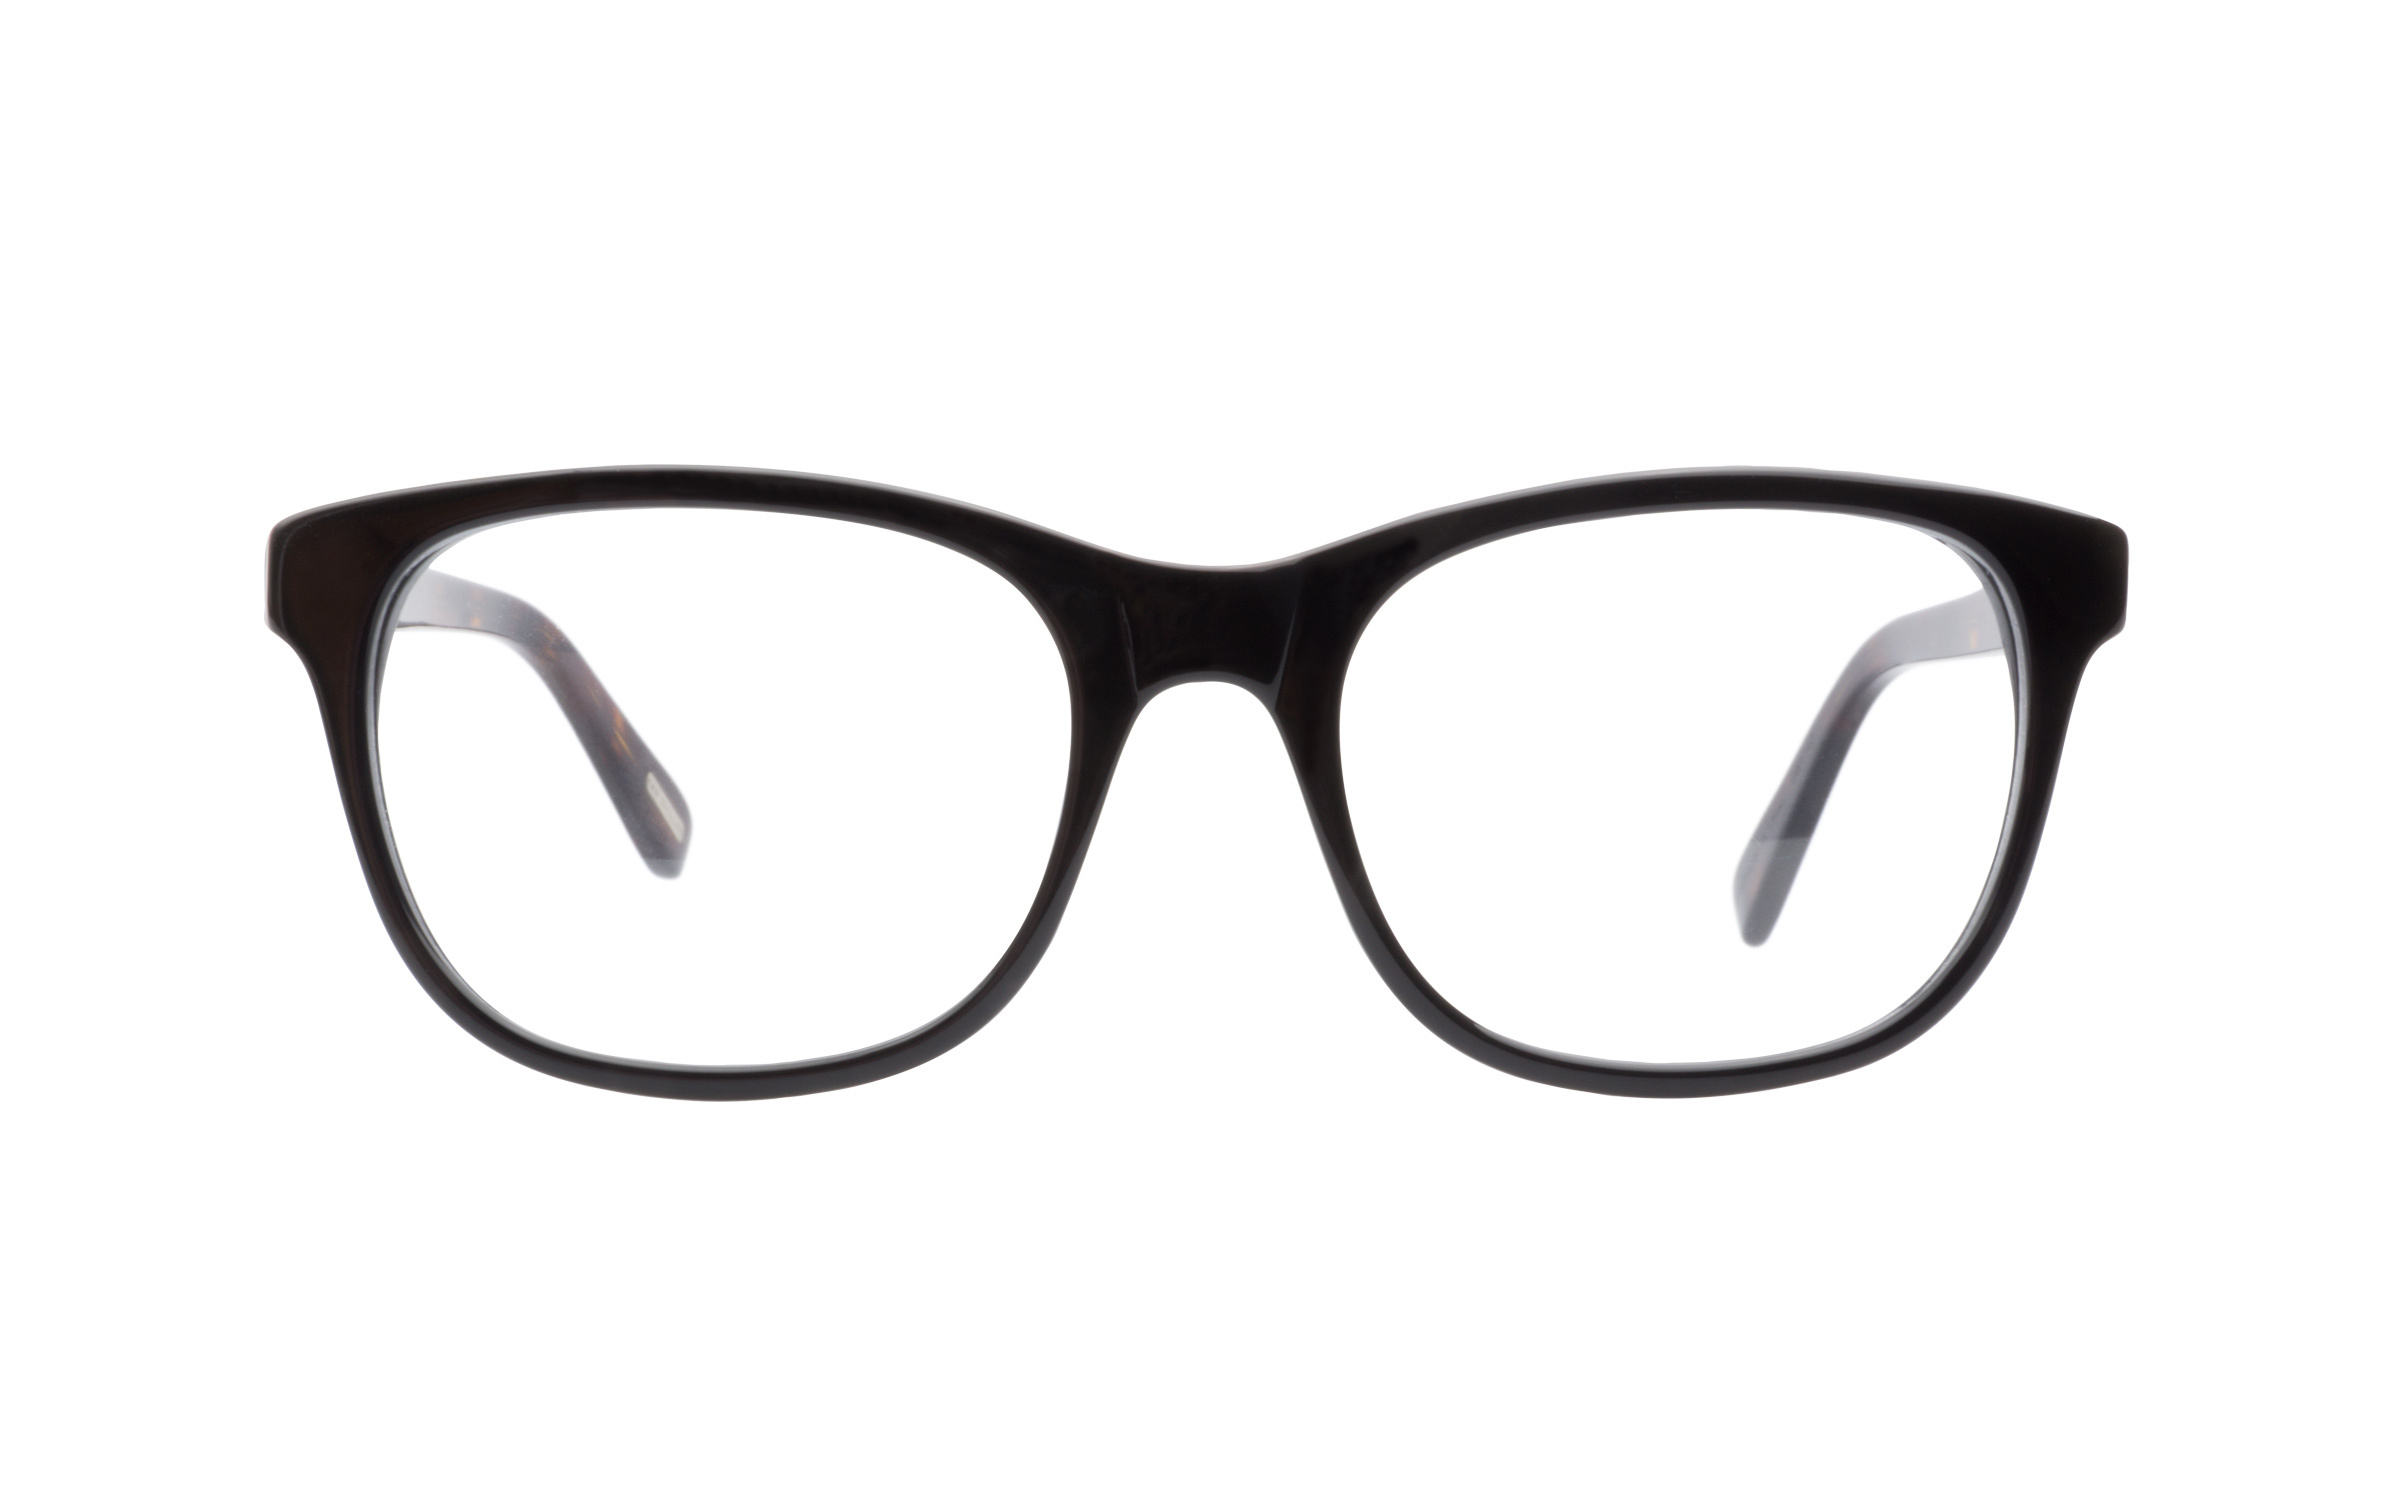 Kam_Dhillon_Womens_Glasses_Retro_Black_Acetate_Online_Coastal